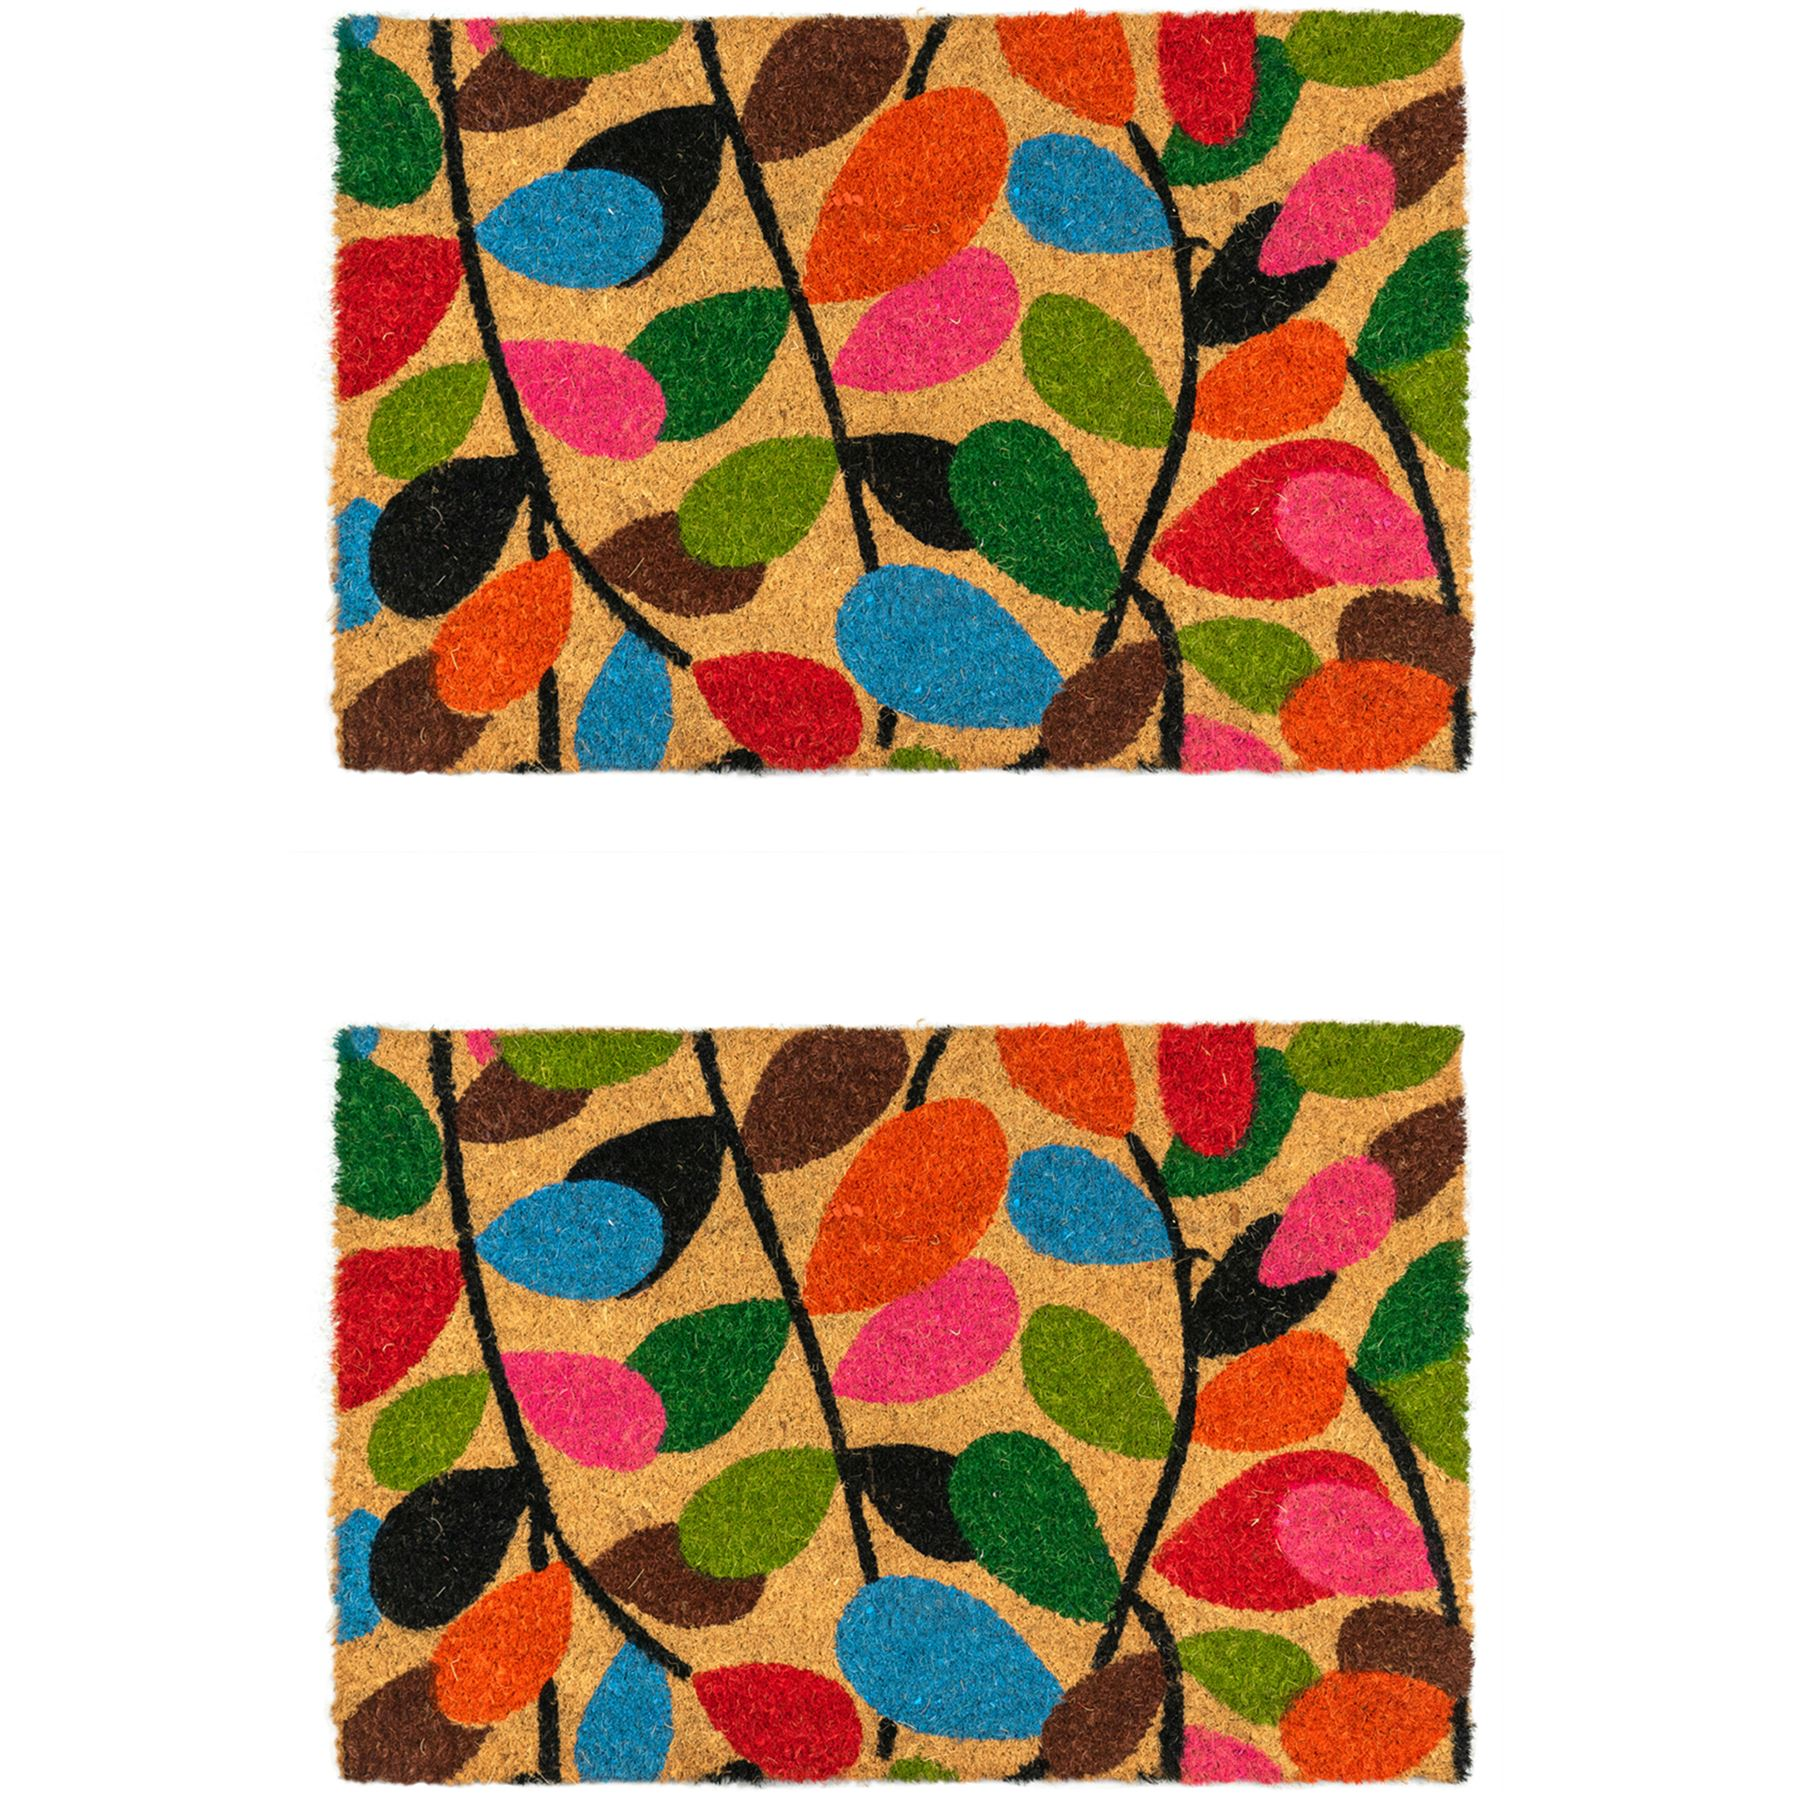 Carolines Treasures Collie Checkerboard green Pair of Pot Holders BB3816PTHD 7.5HX7.5W Multicolor